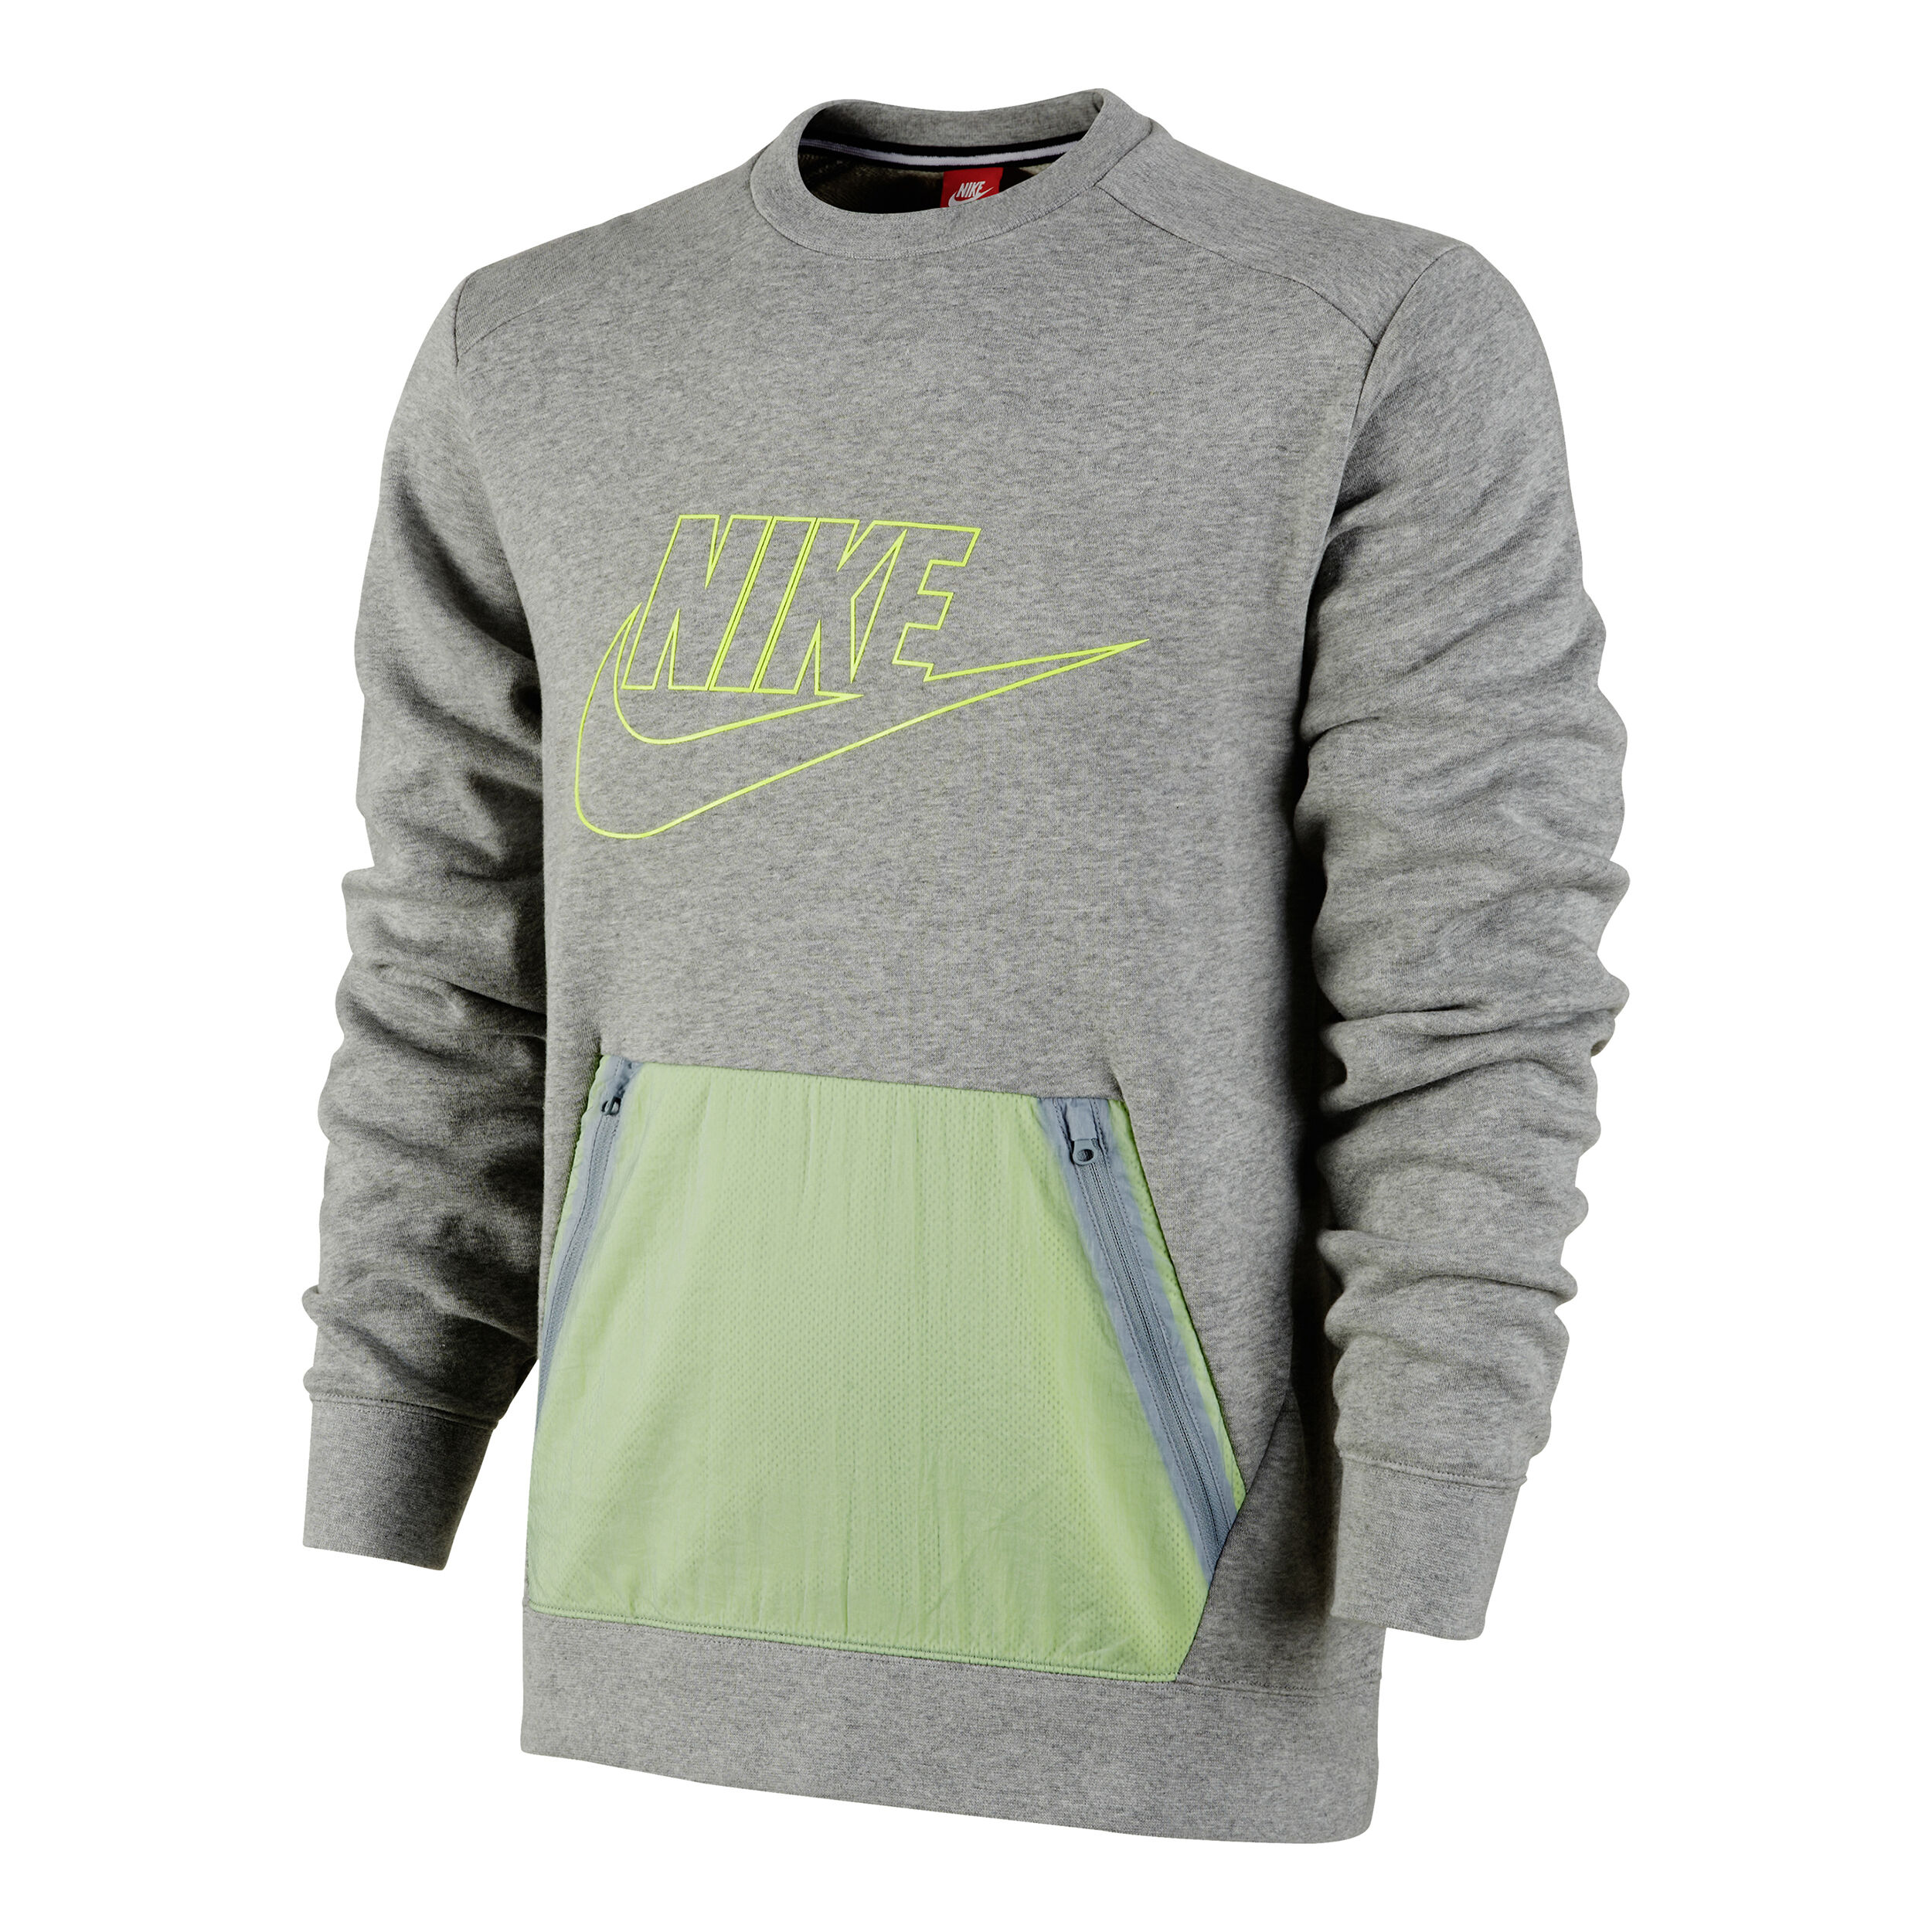 Nike Hybrid Crew Sweatshirt | JD Sports Sverige